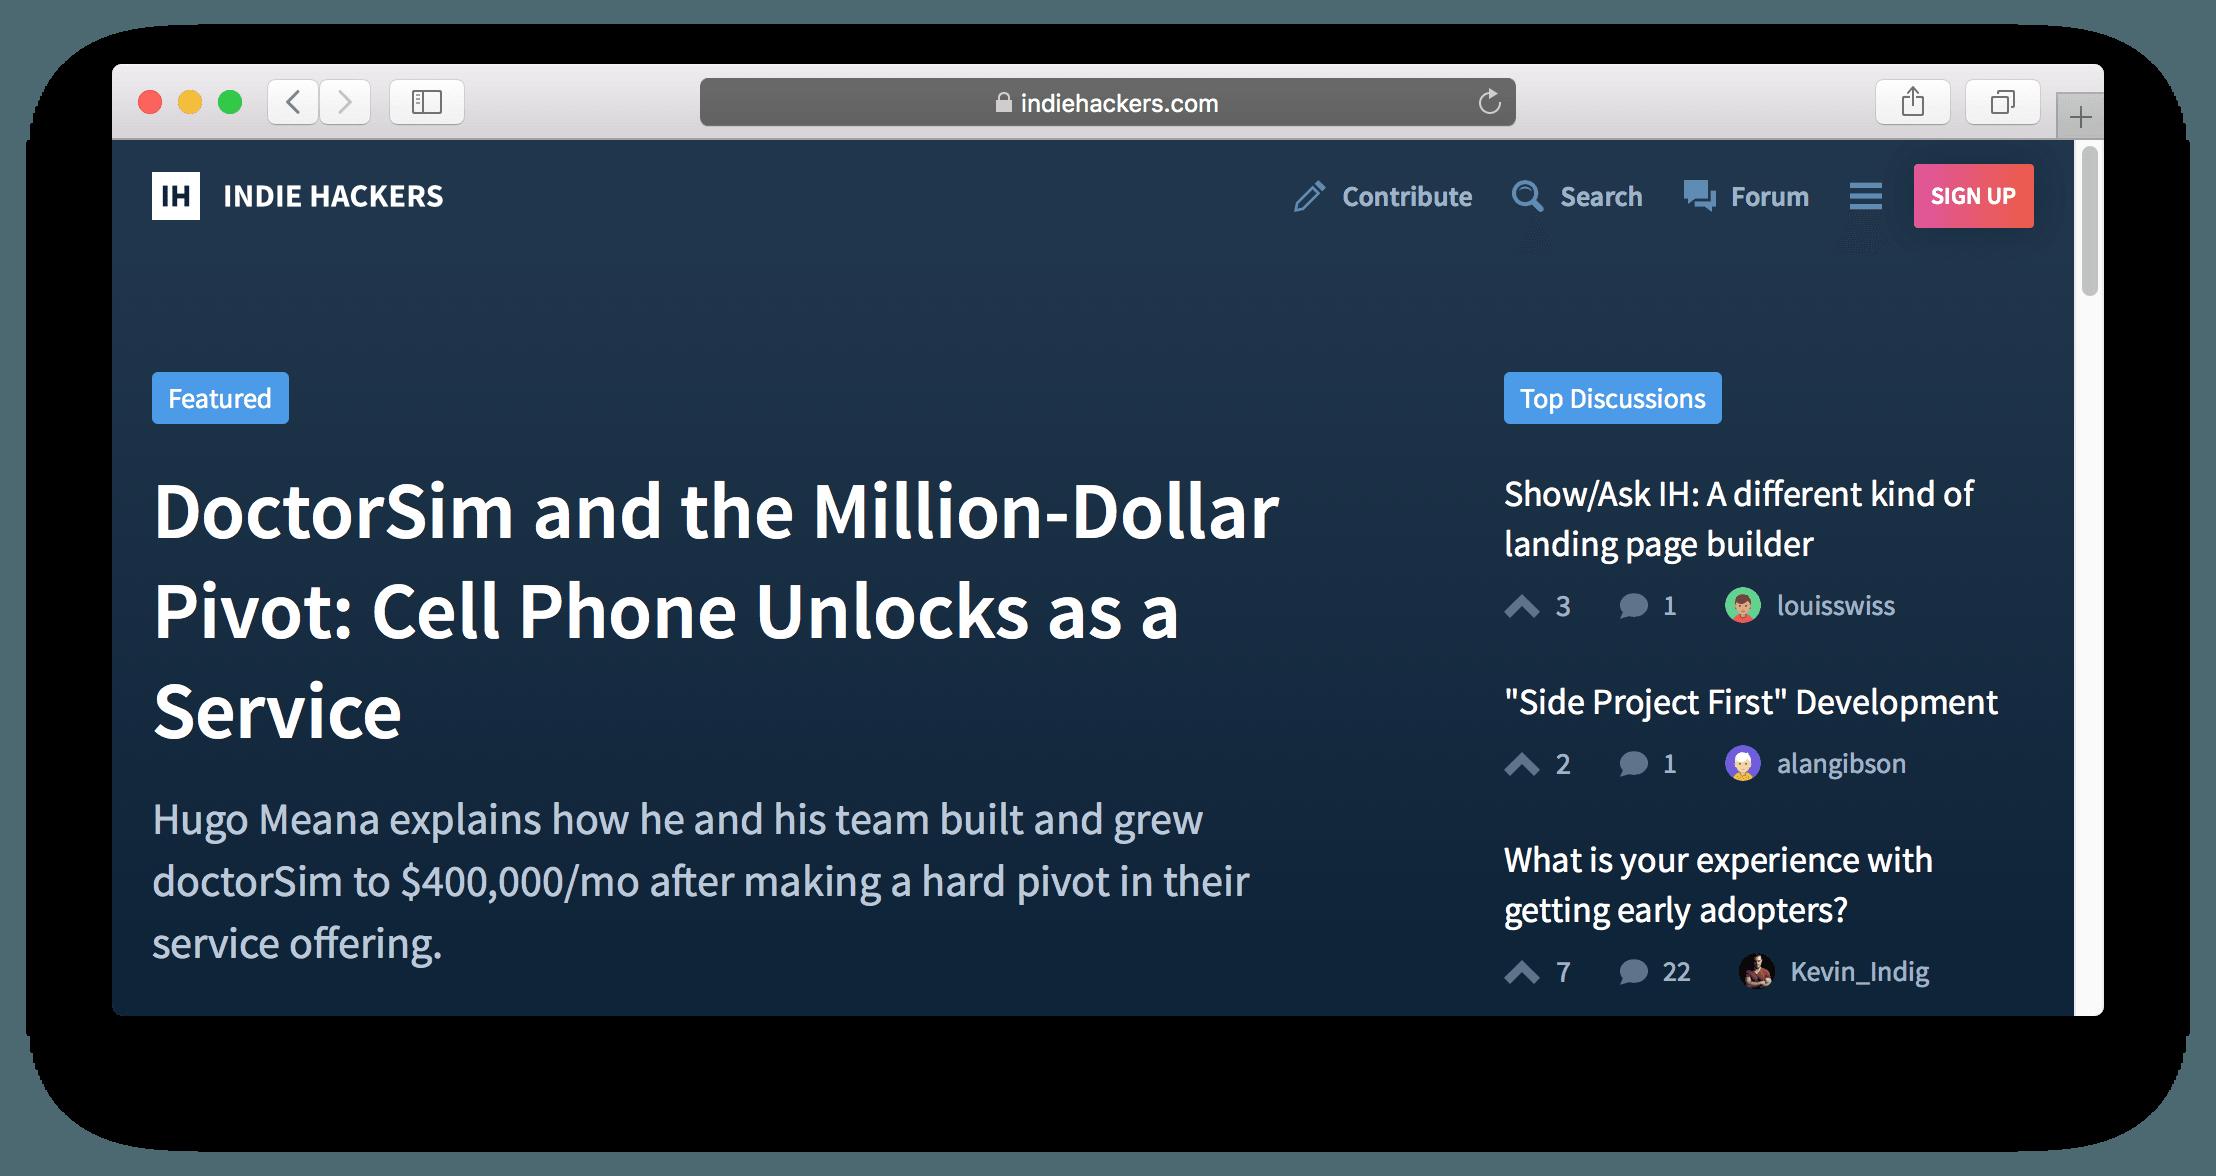 indiehacker.com image